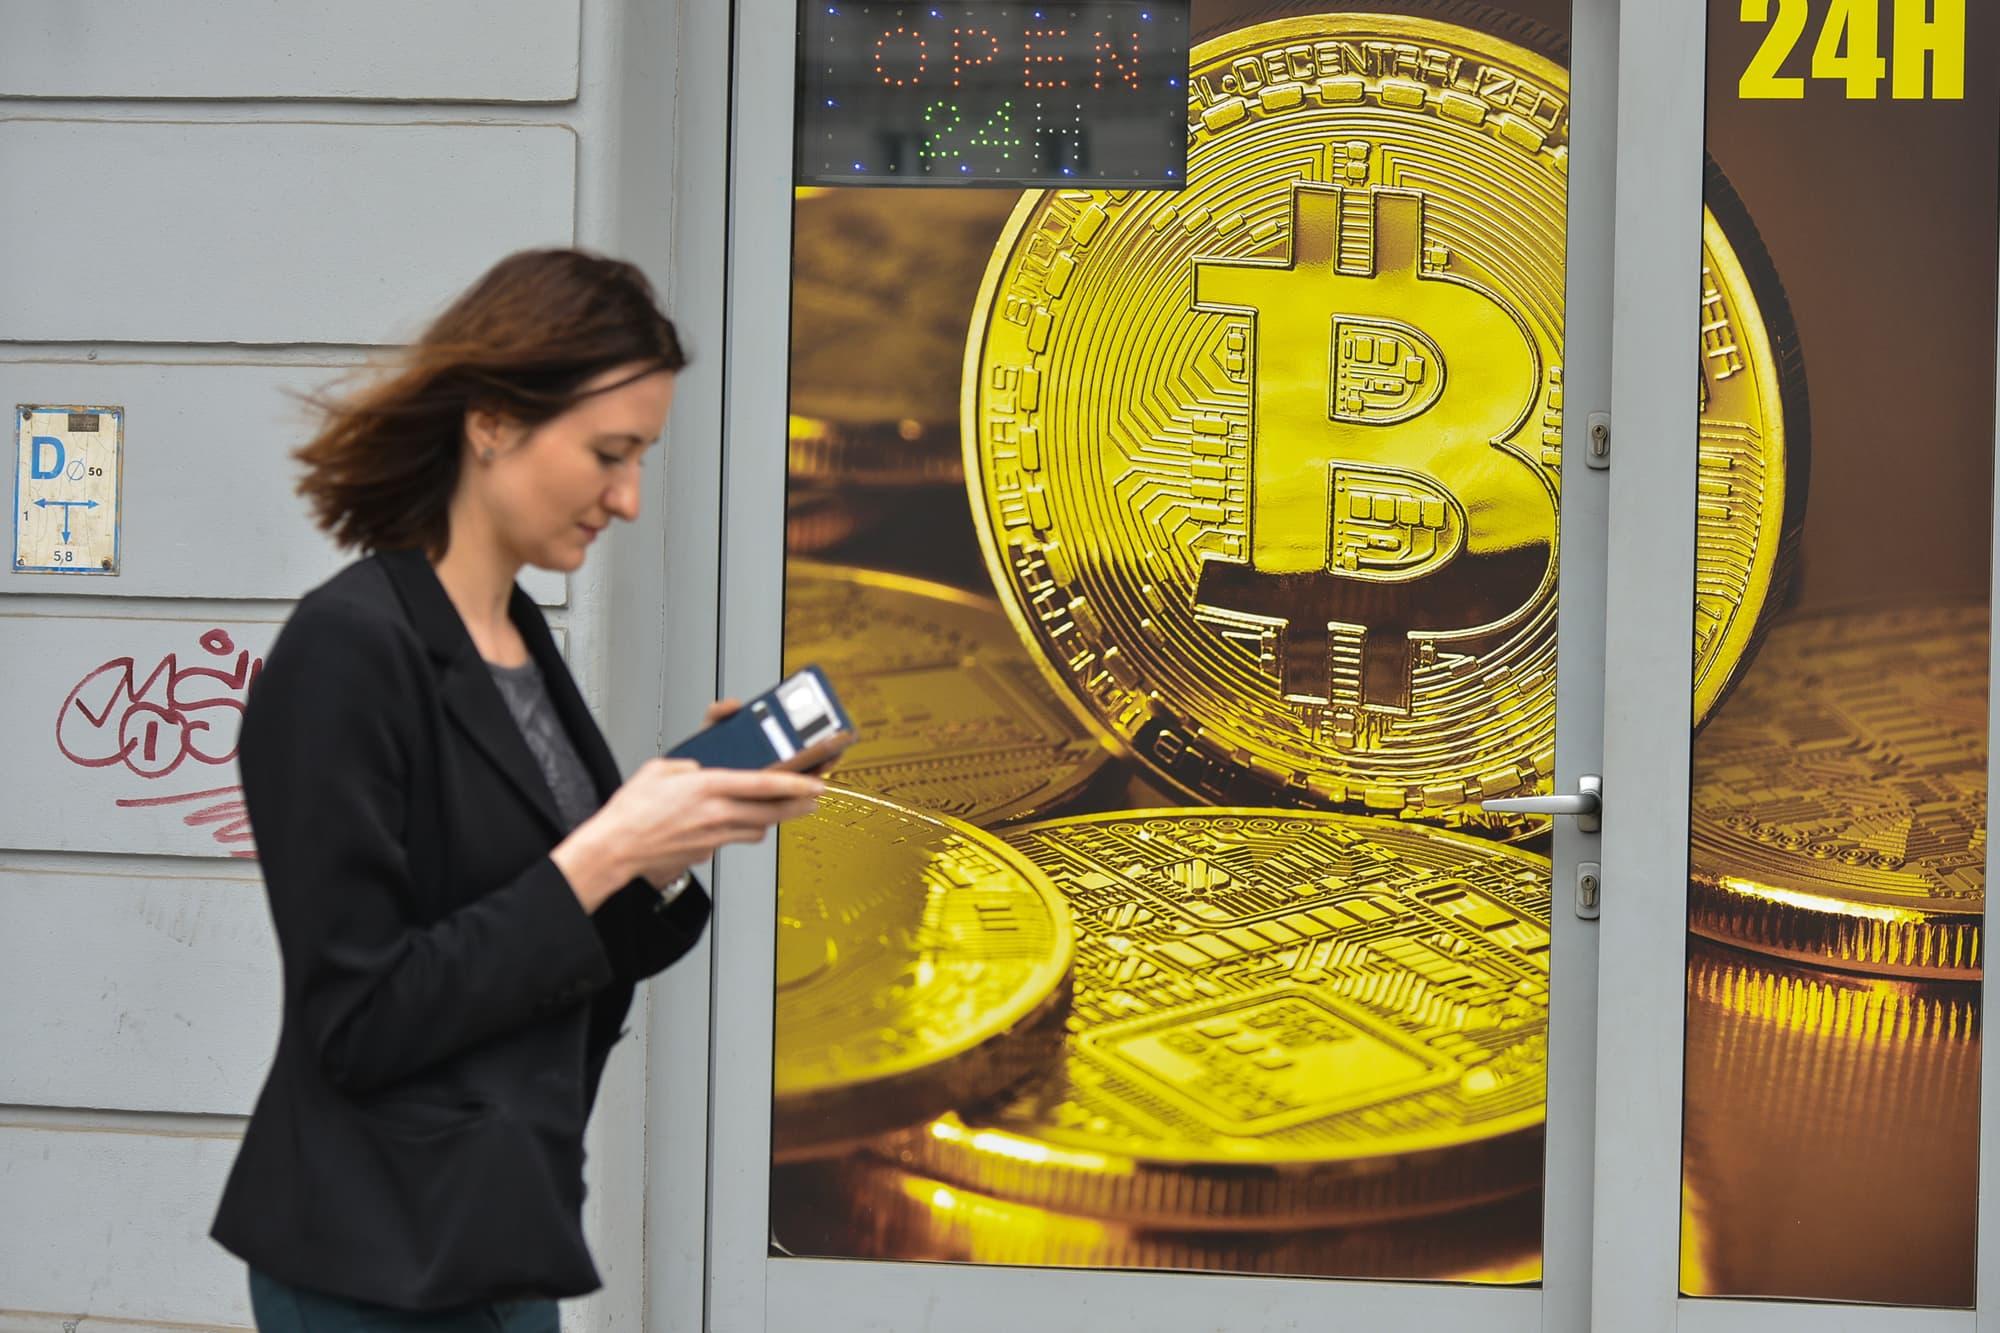 guadagnare gratis criptovalute moneta criptovaluta